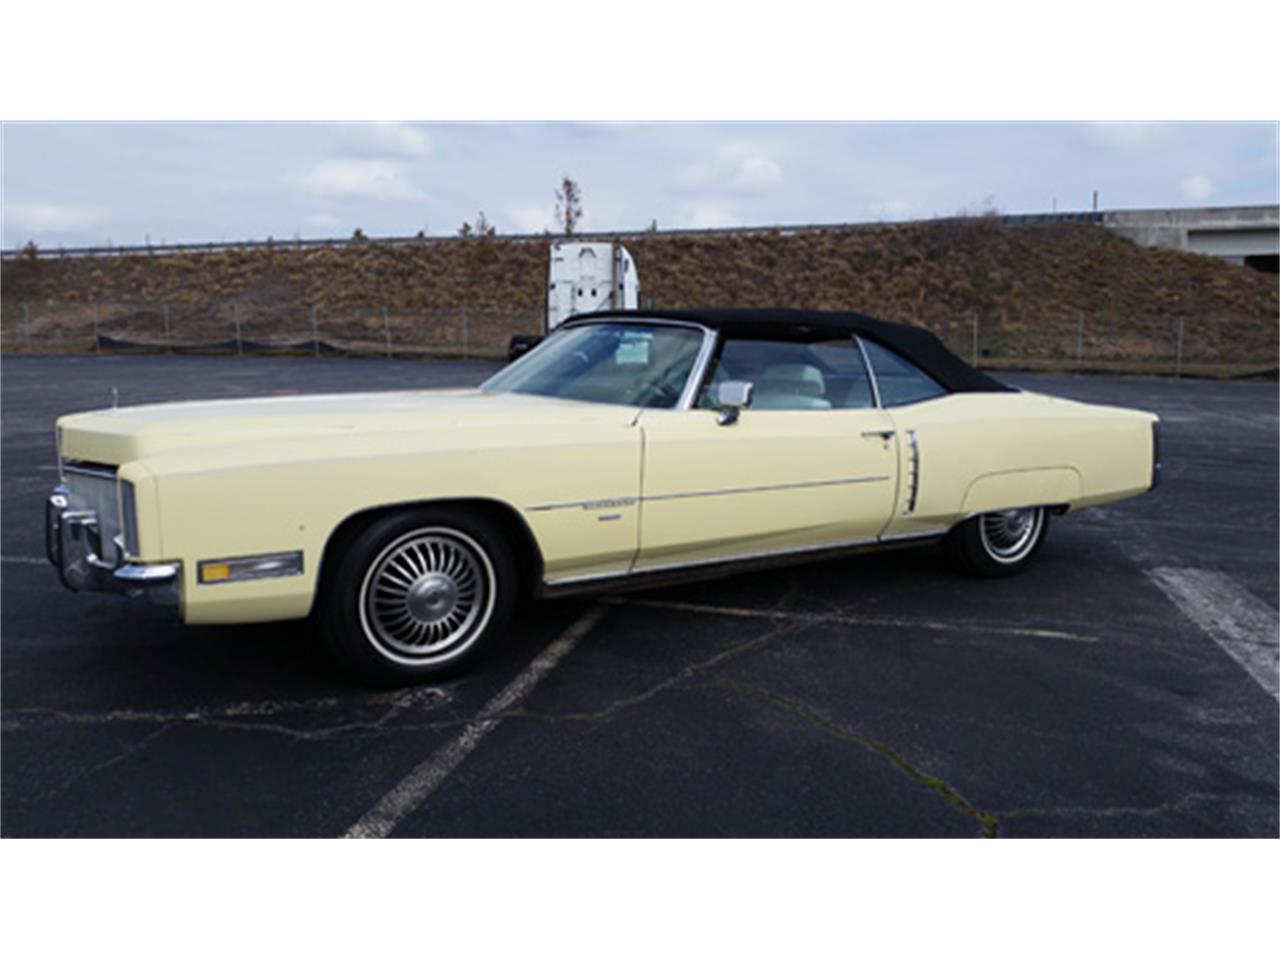 Cadillac Eldorado 1971 prix tout compris 1971